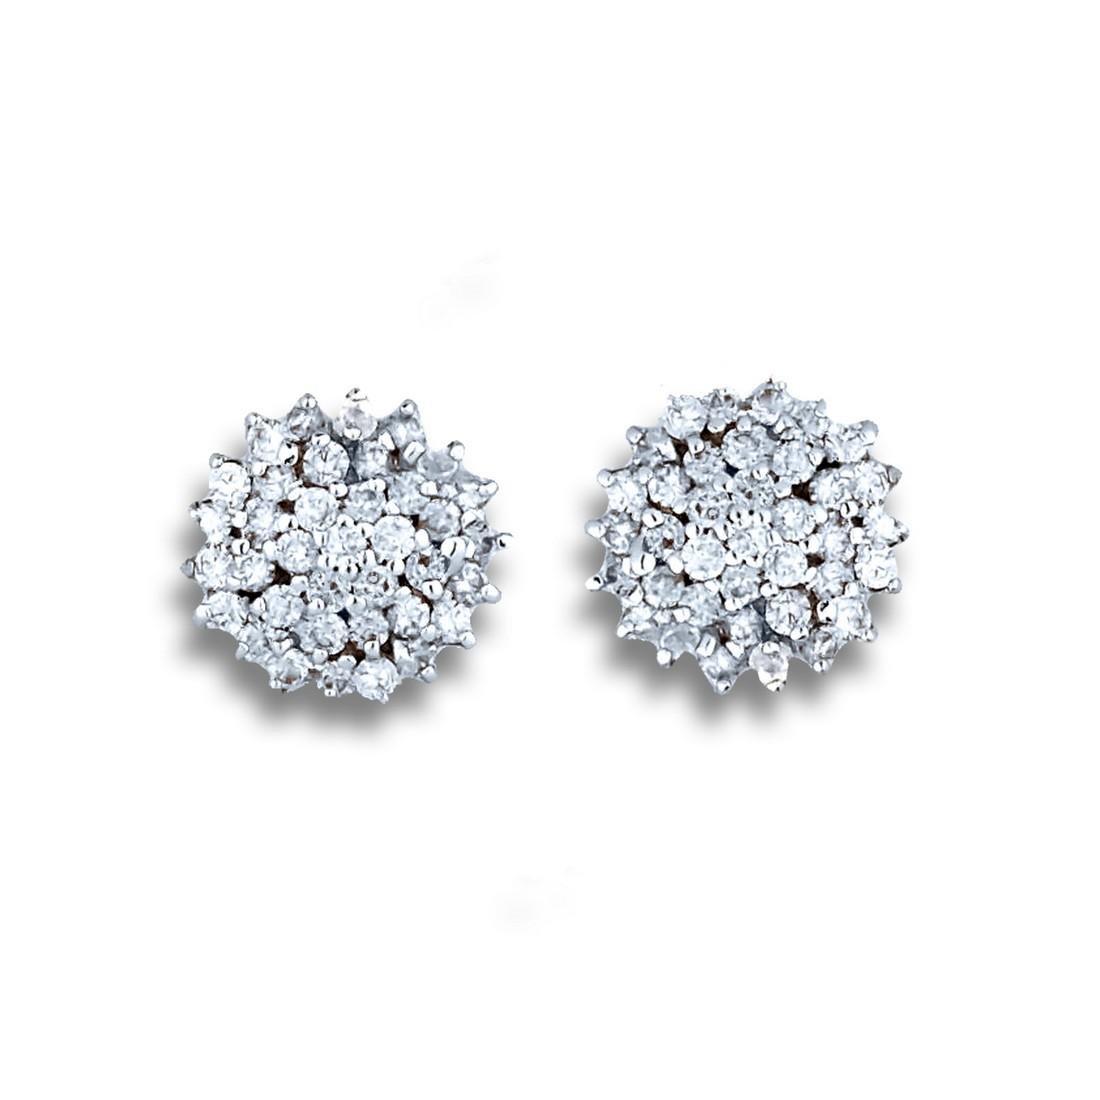 Cluster Diamond Earrings, 14 karat and .75 Carat Total